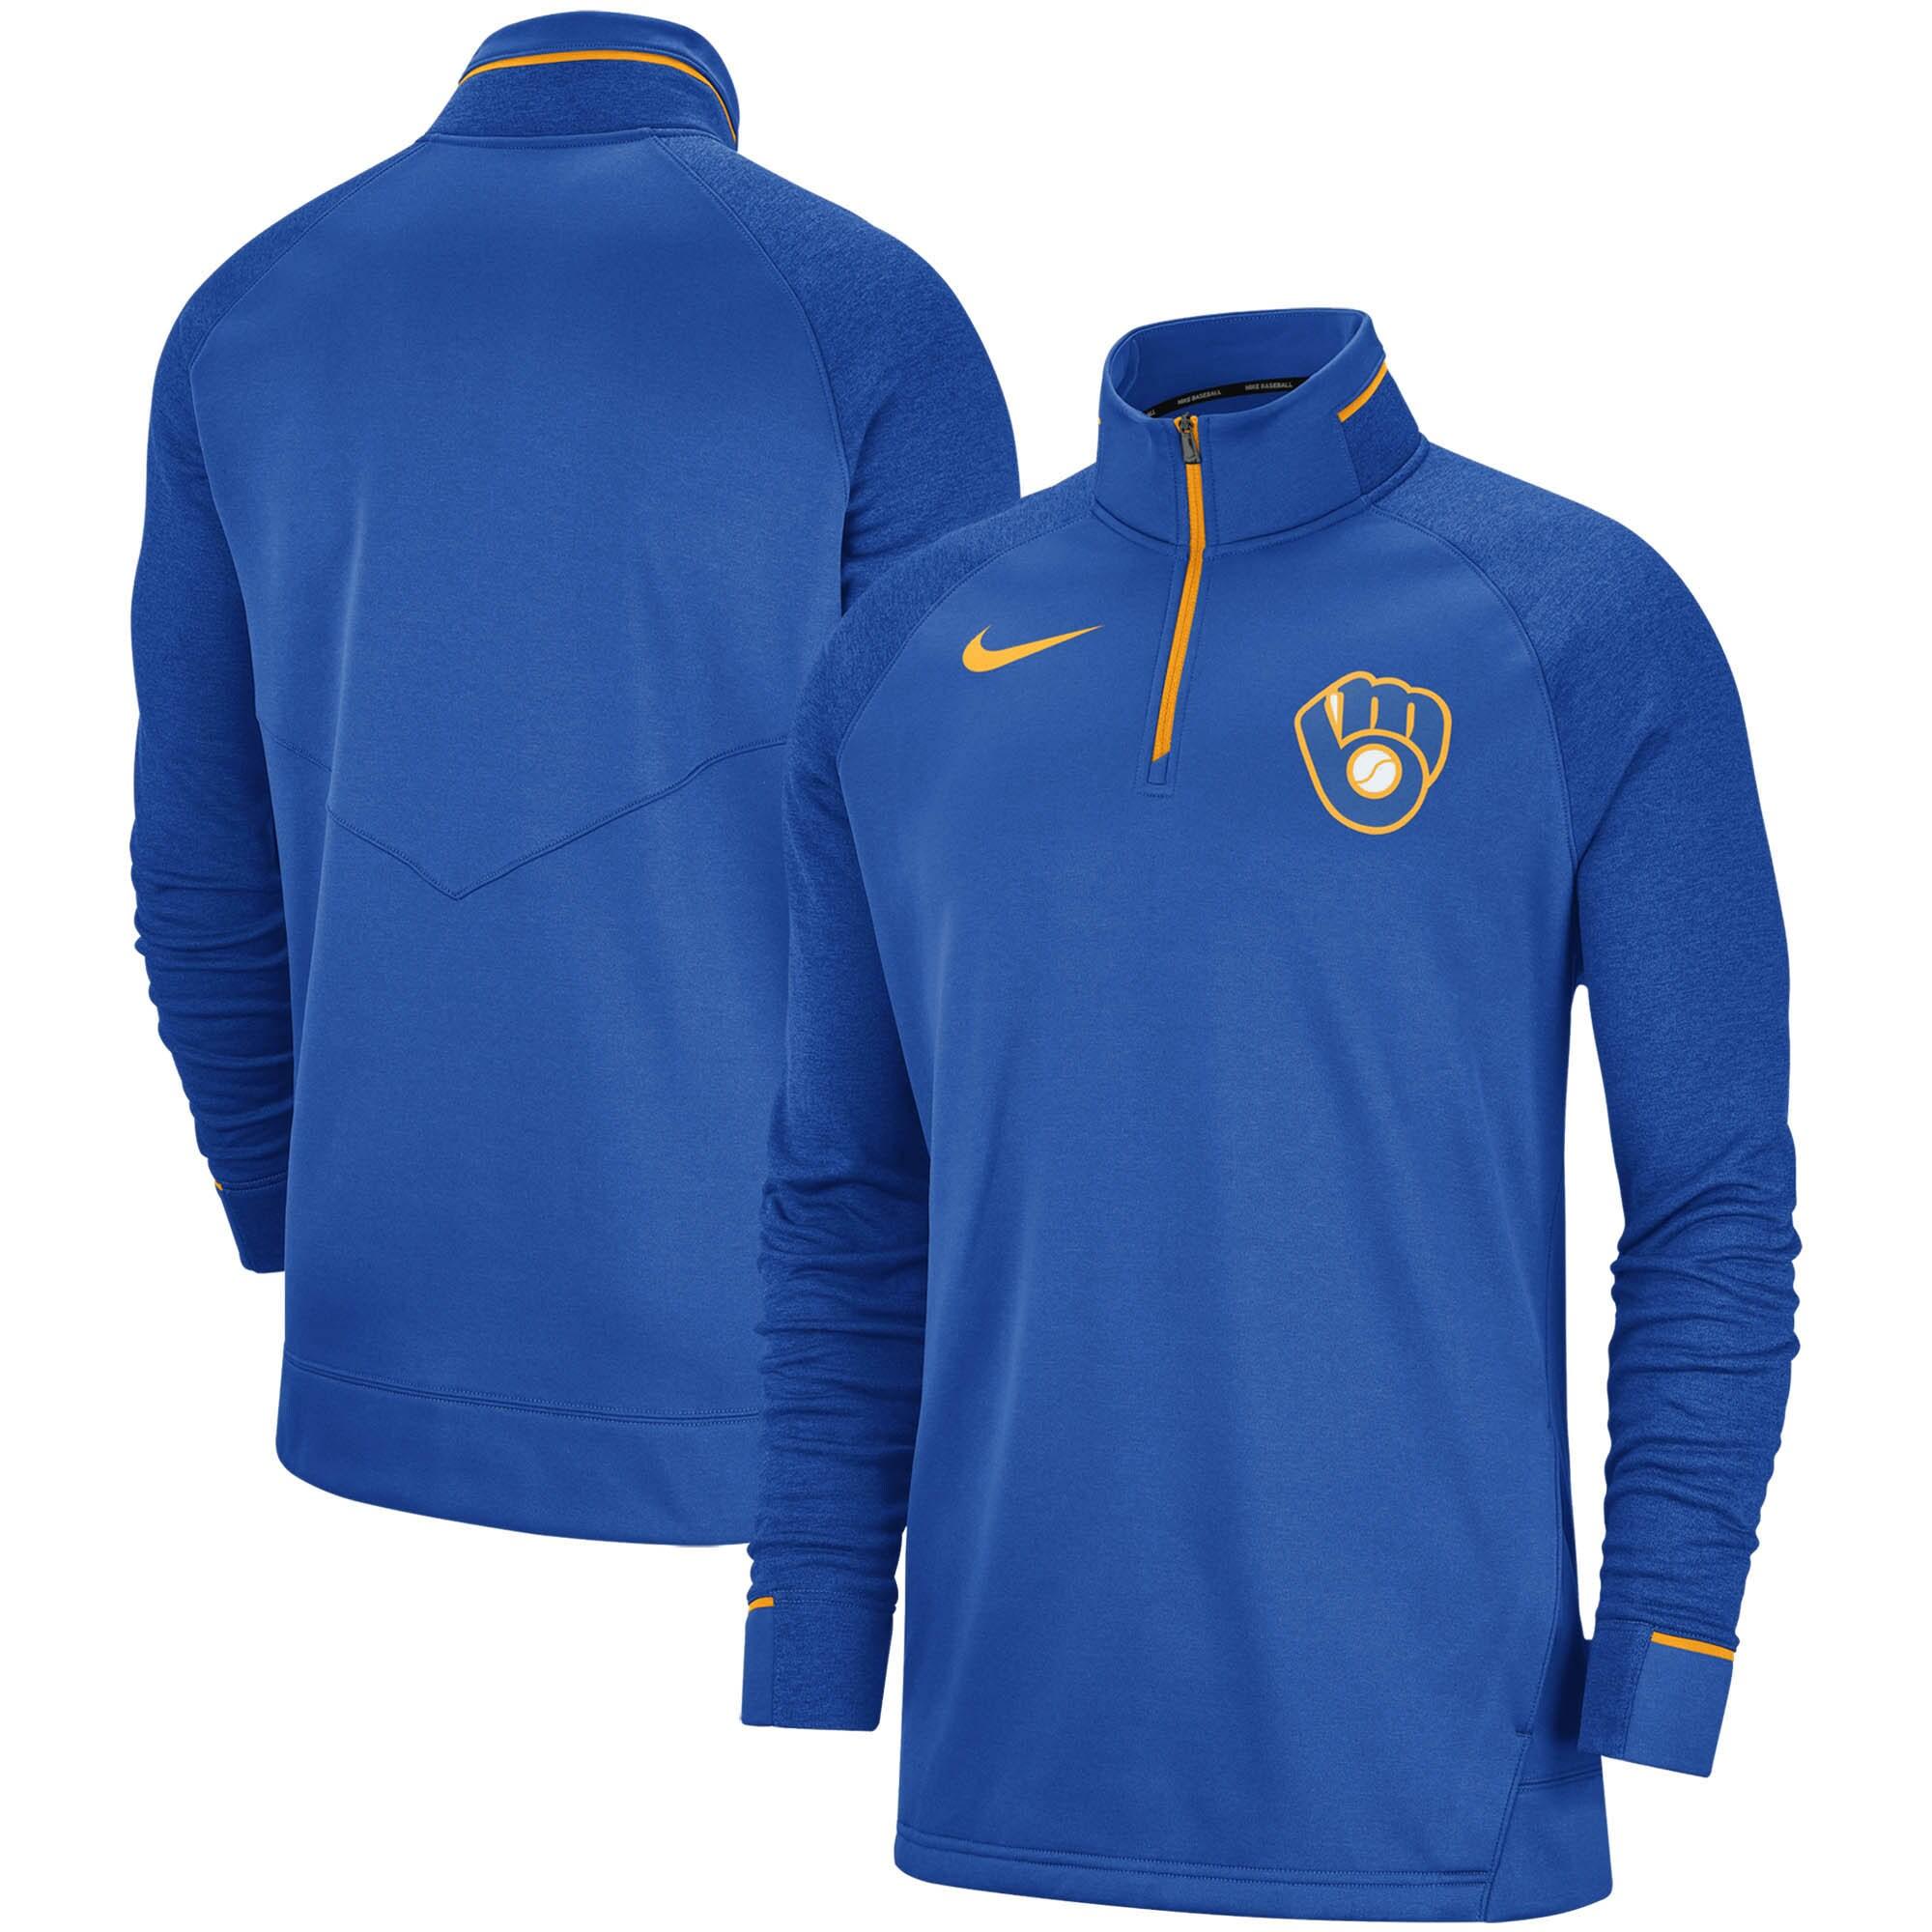 Milwaukee Brewers Nike Elite Game Performance Raglan Sleeve Quarter-Zip Pullover Jacket - Royal